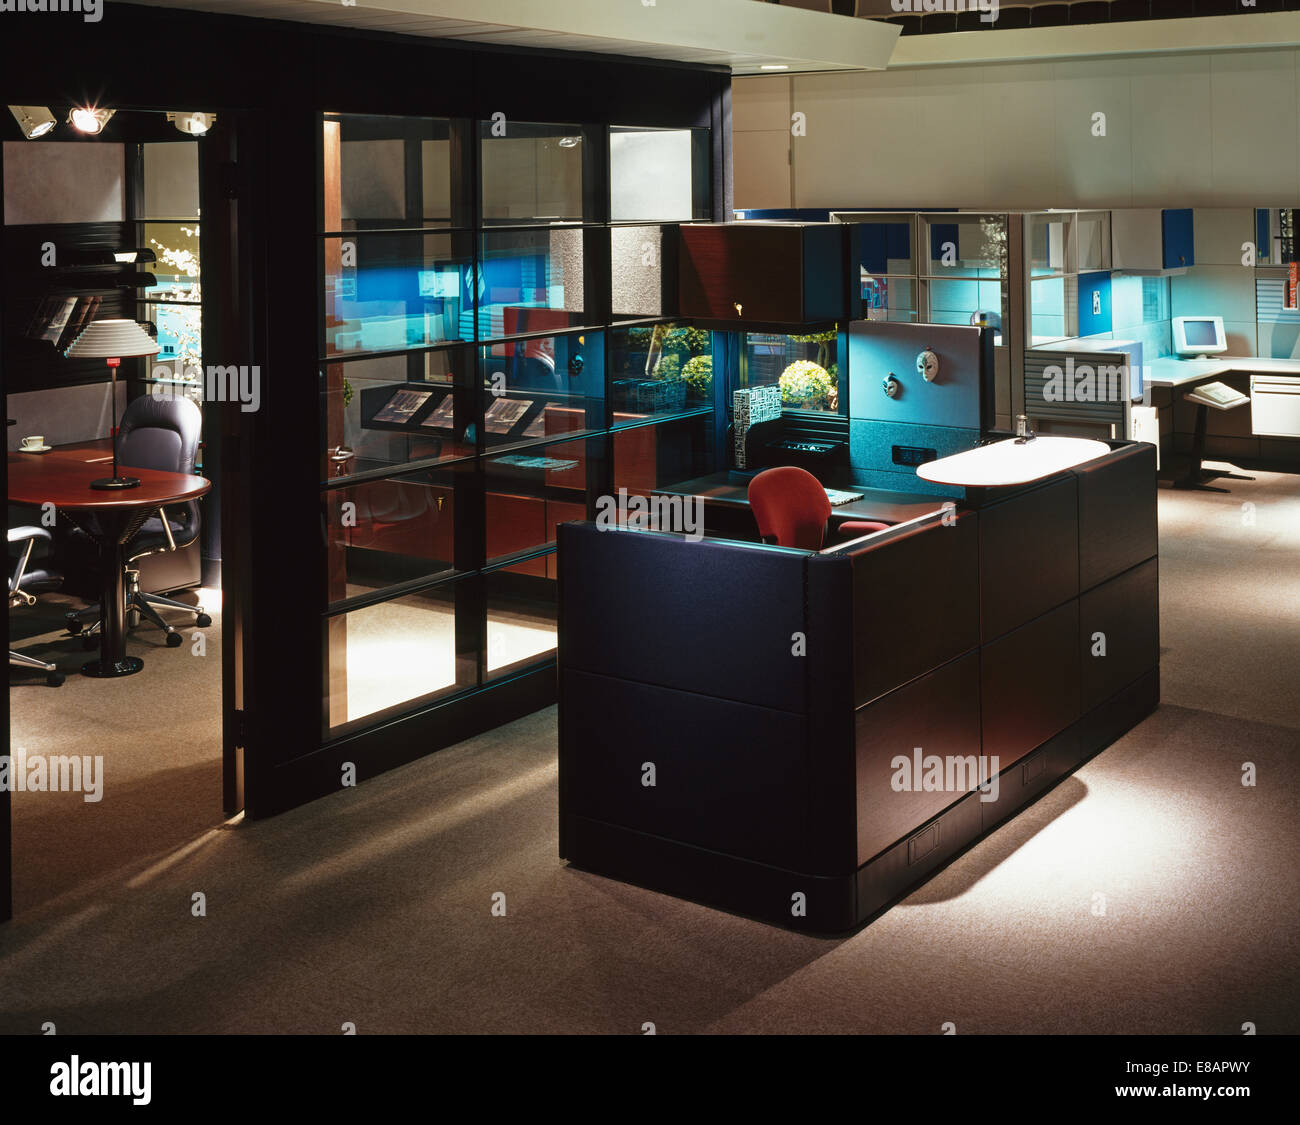 Inside an eighties office - Stock Image